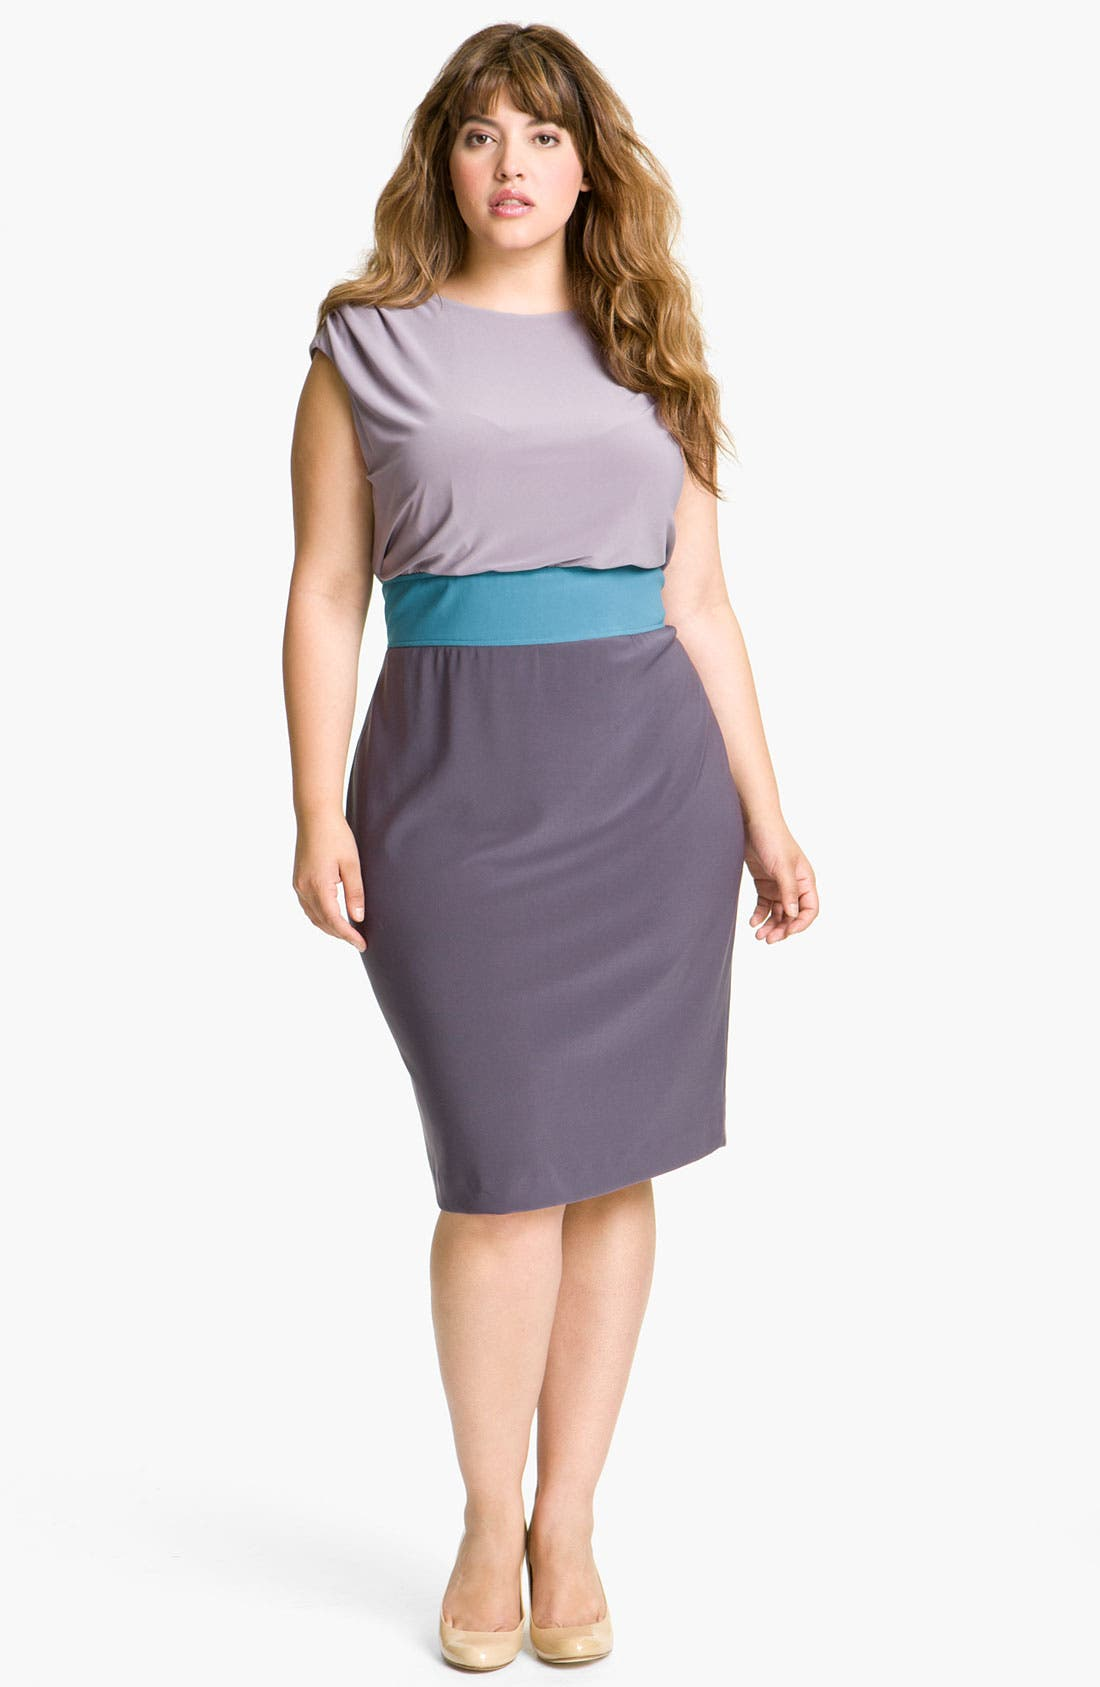 Alternate Image 1 Selected - Adrianna Papell Colorblock Blouson Sheath Dress (Plus)